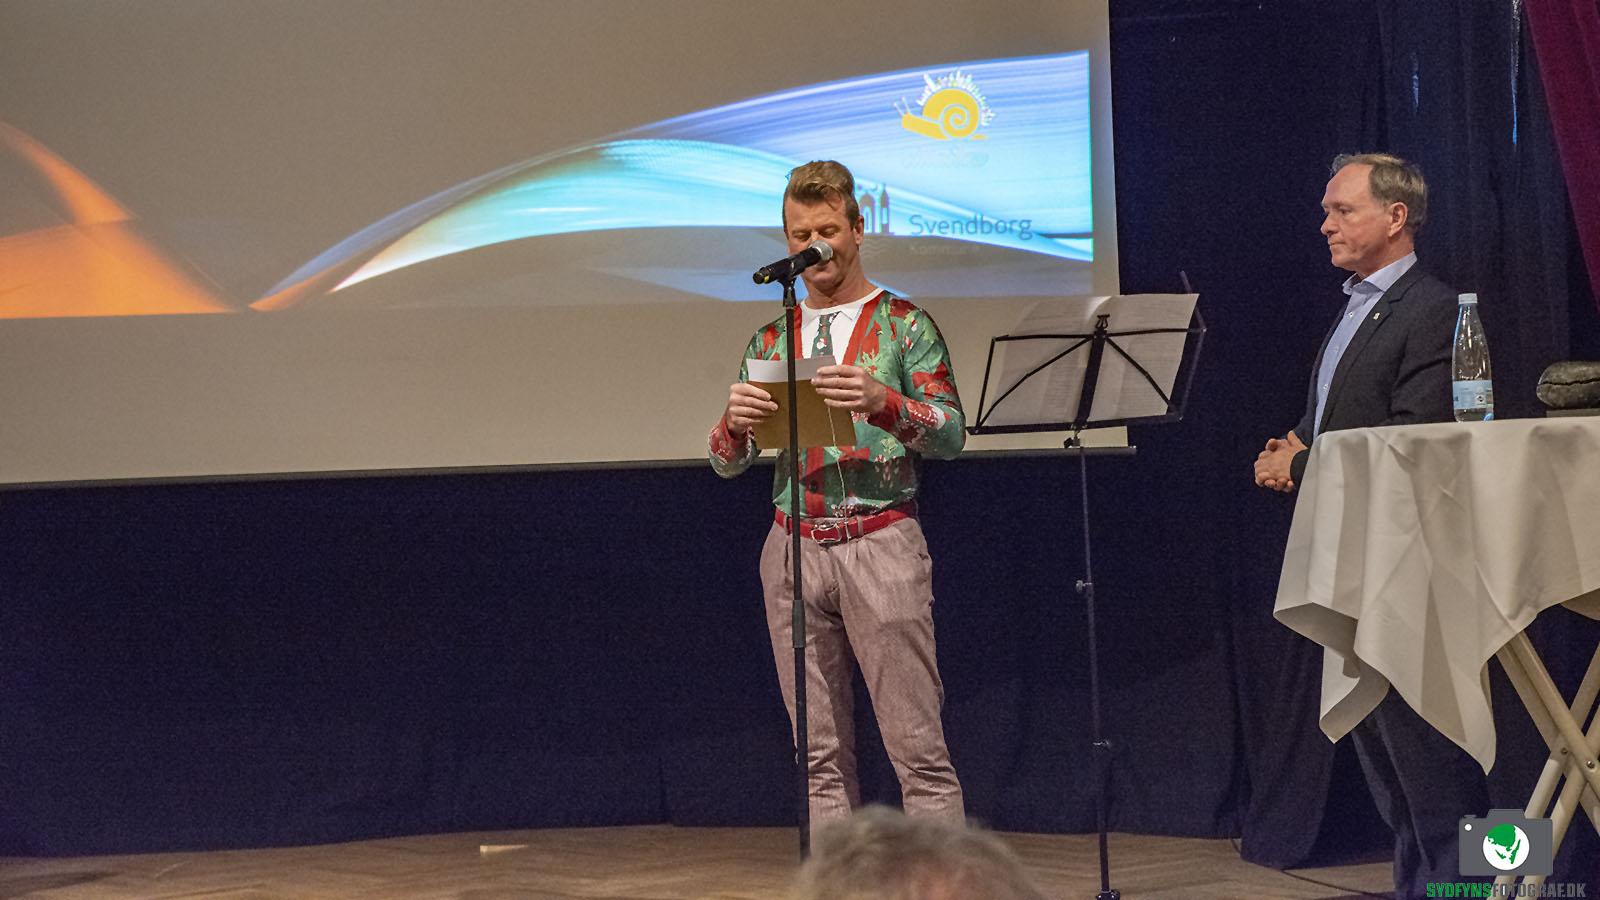 800_8759 Årets kulturpris 2018